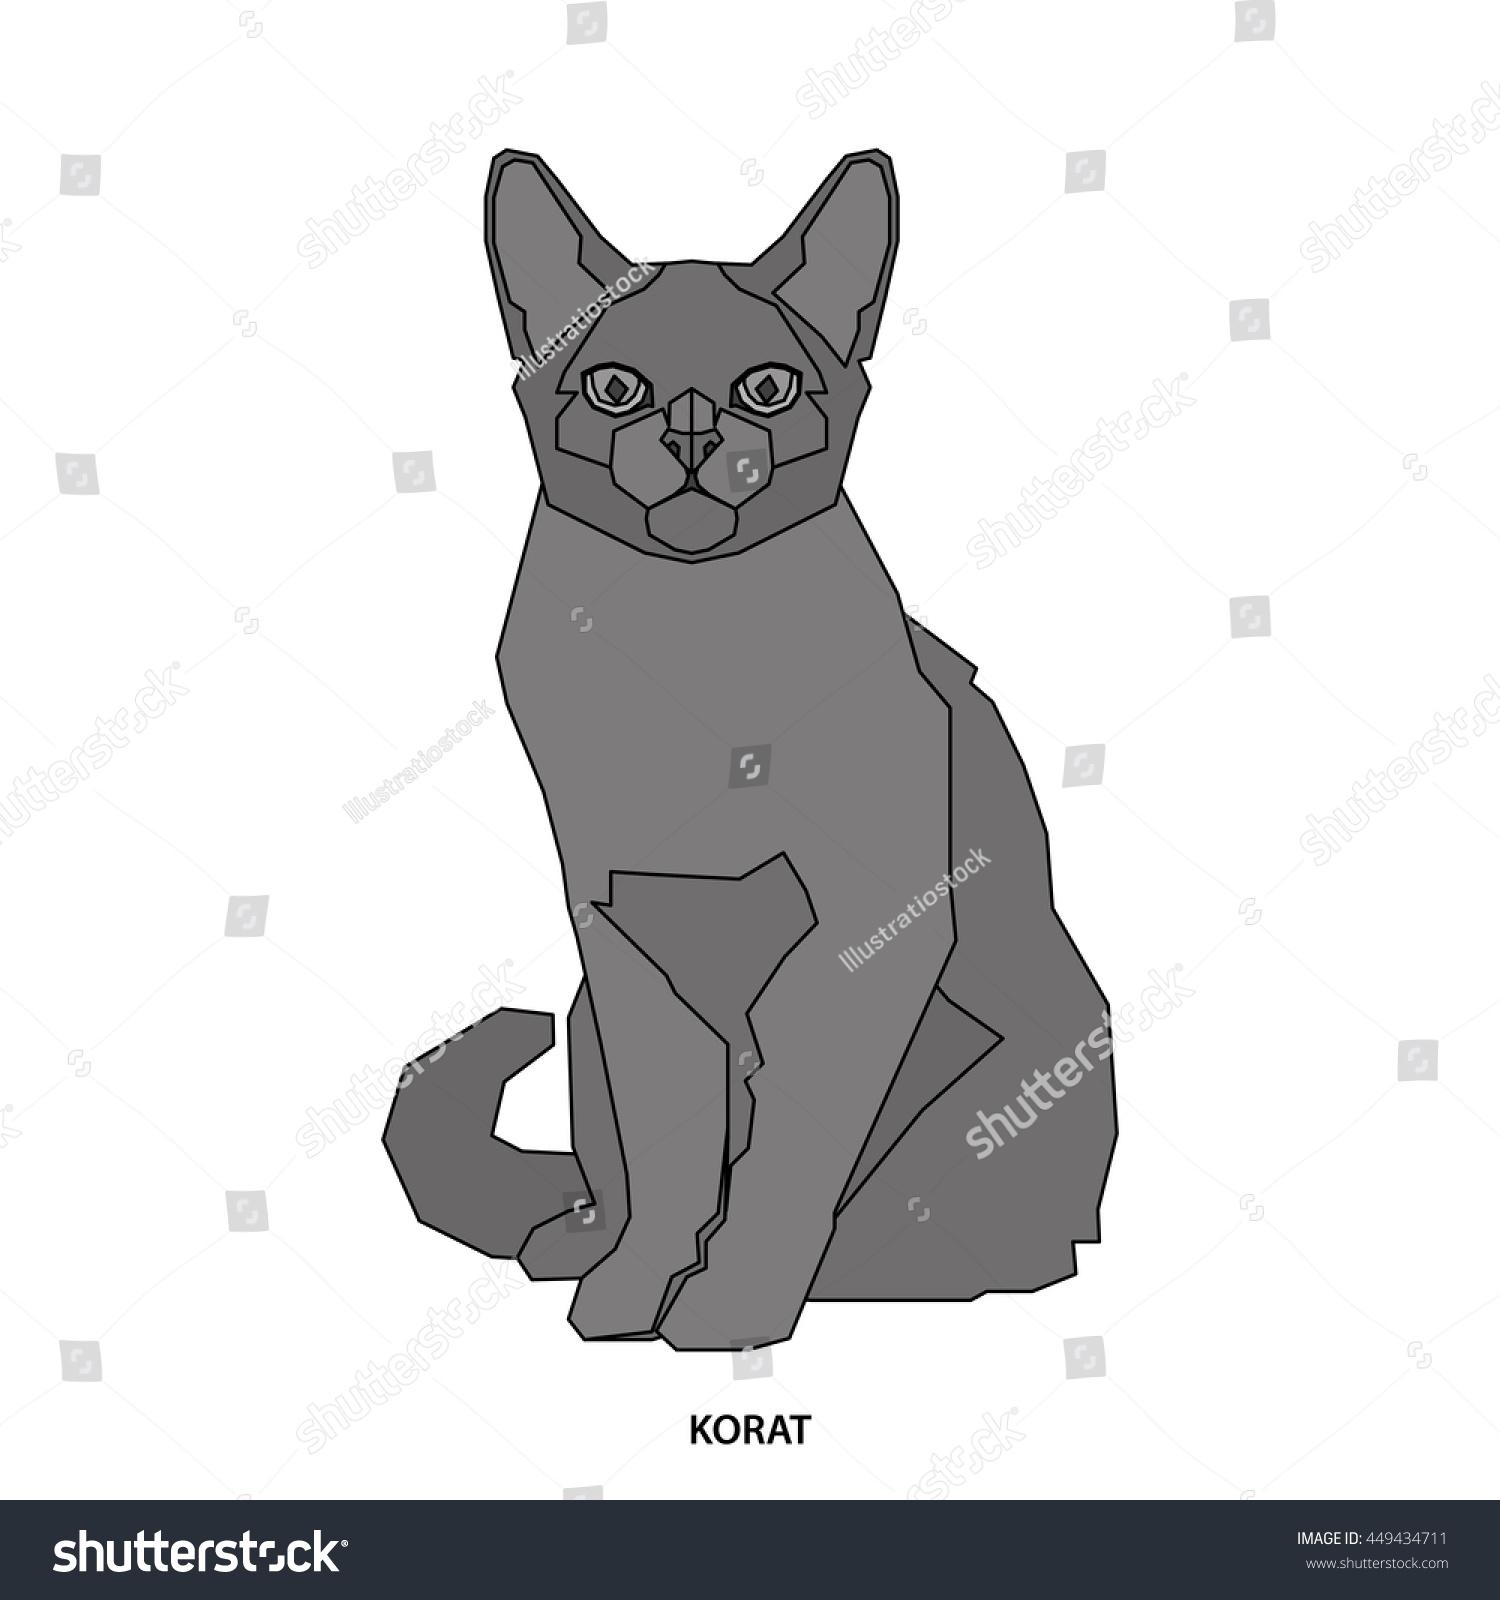 Korat Isolated Cat Breed Vector Illustration Stock Vector